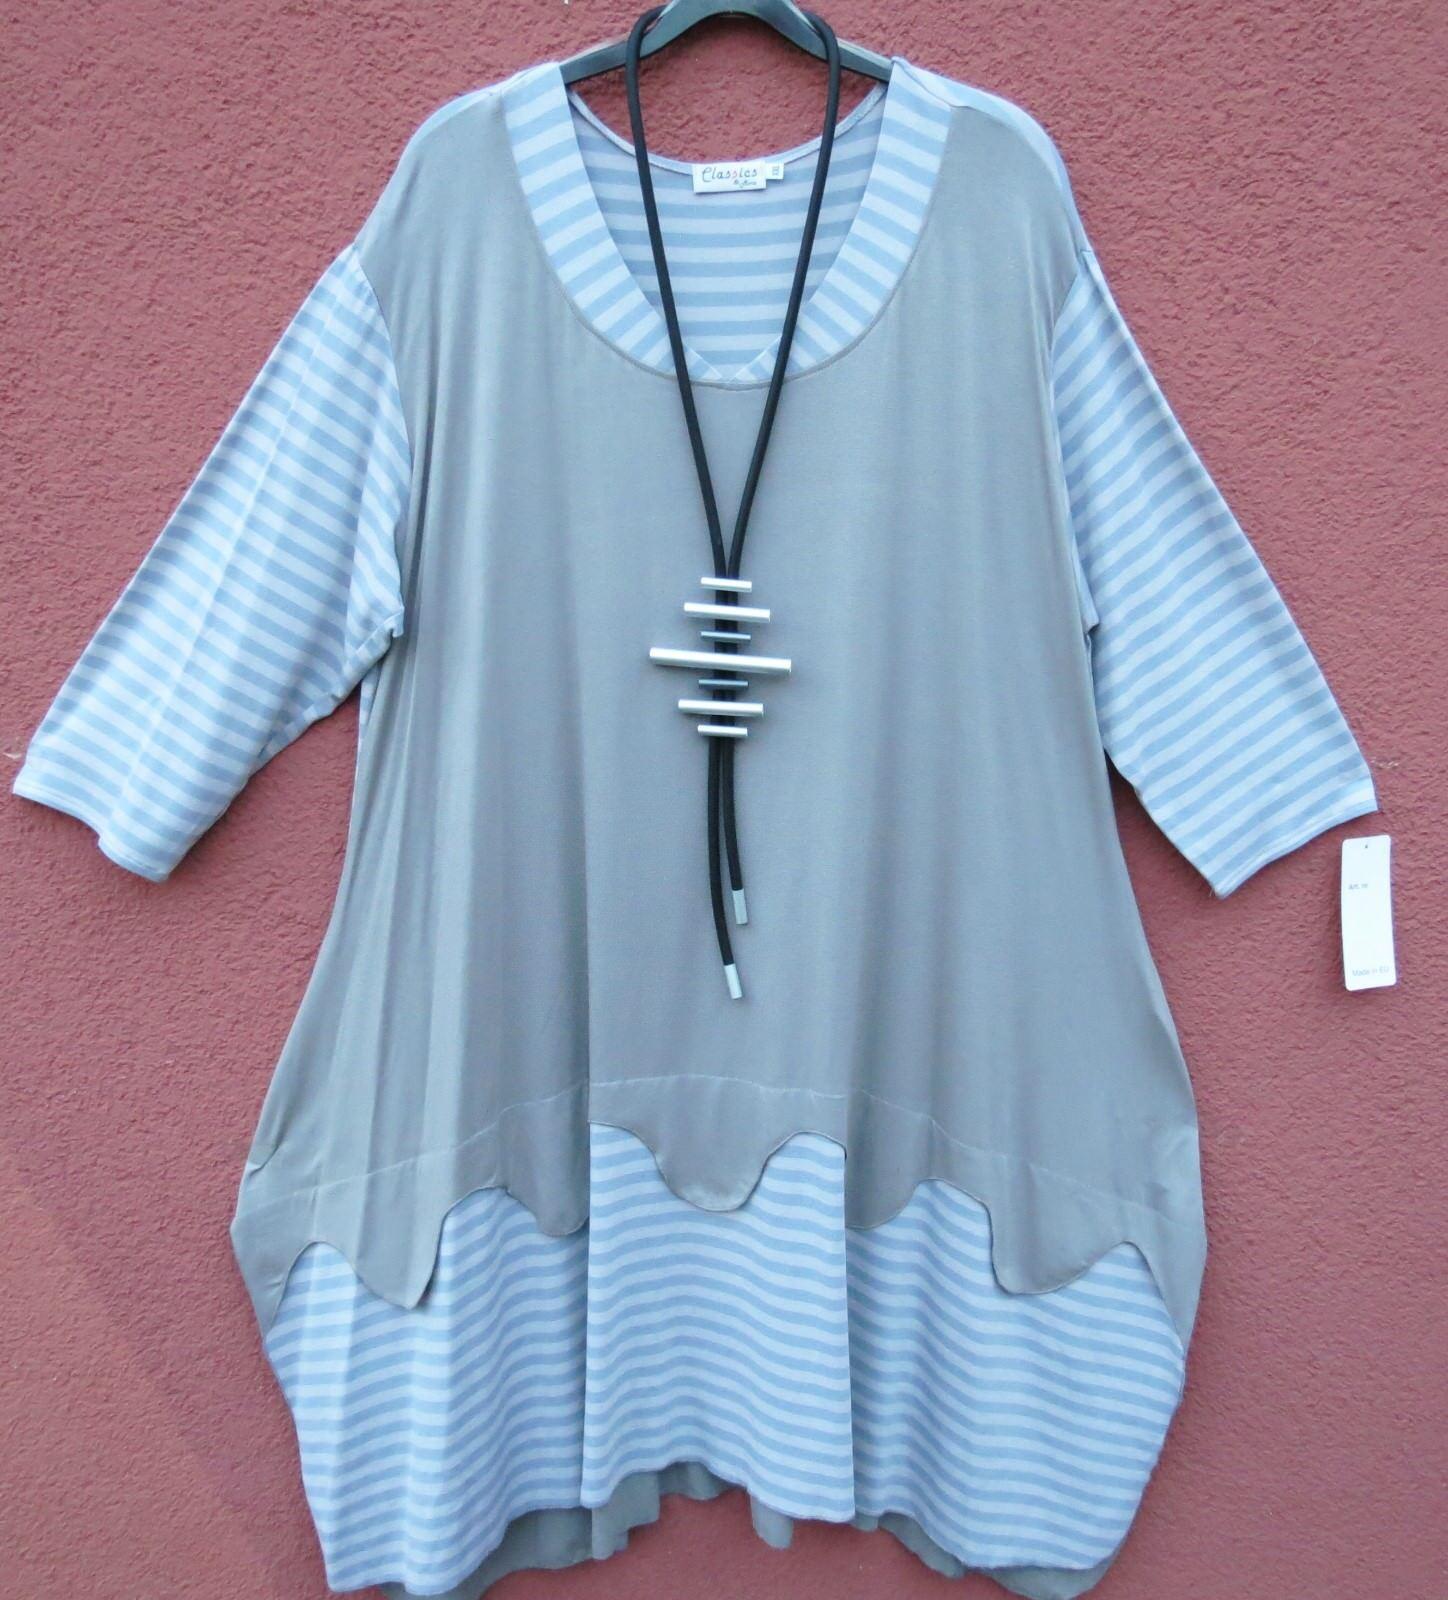 NEU Classics & More Ballonkeid Kleid Robe Dress Vestito XXL 52 54 Lagenlook